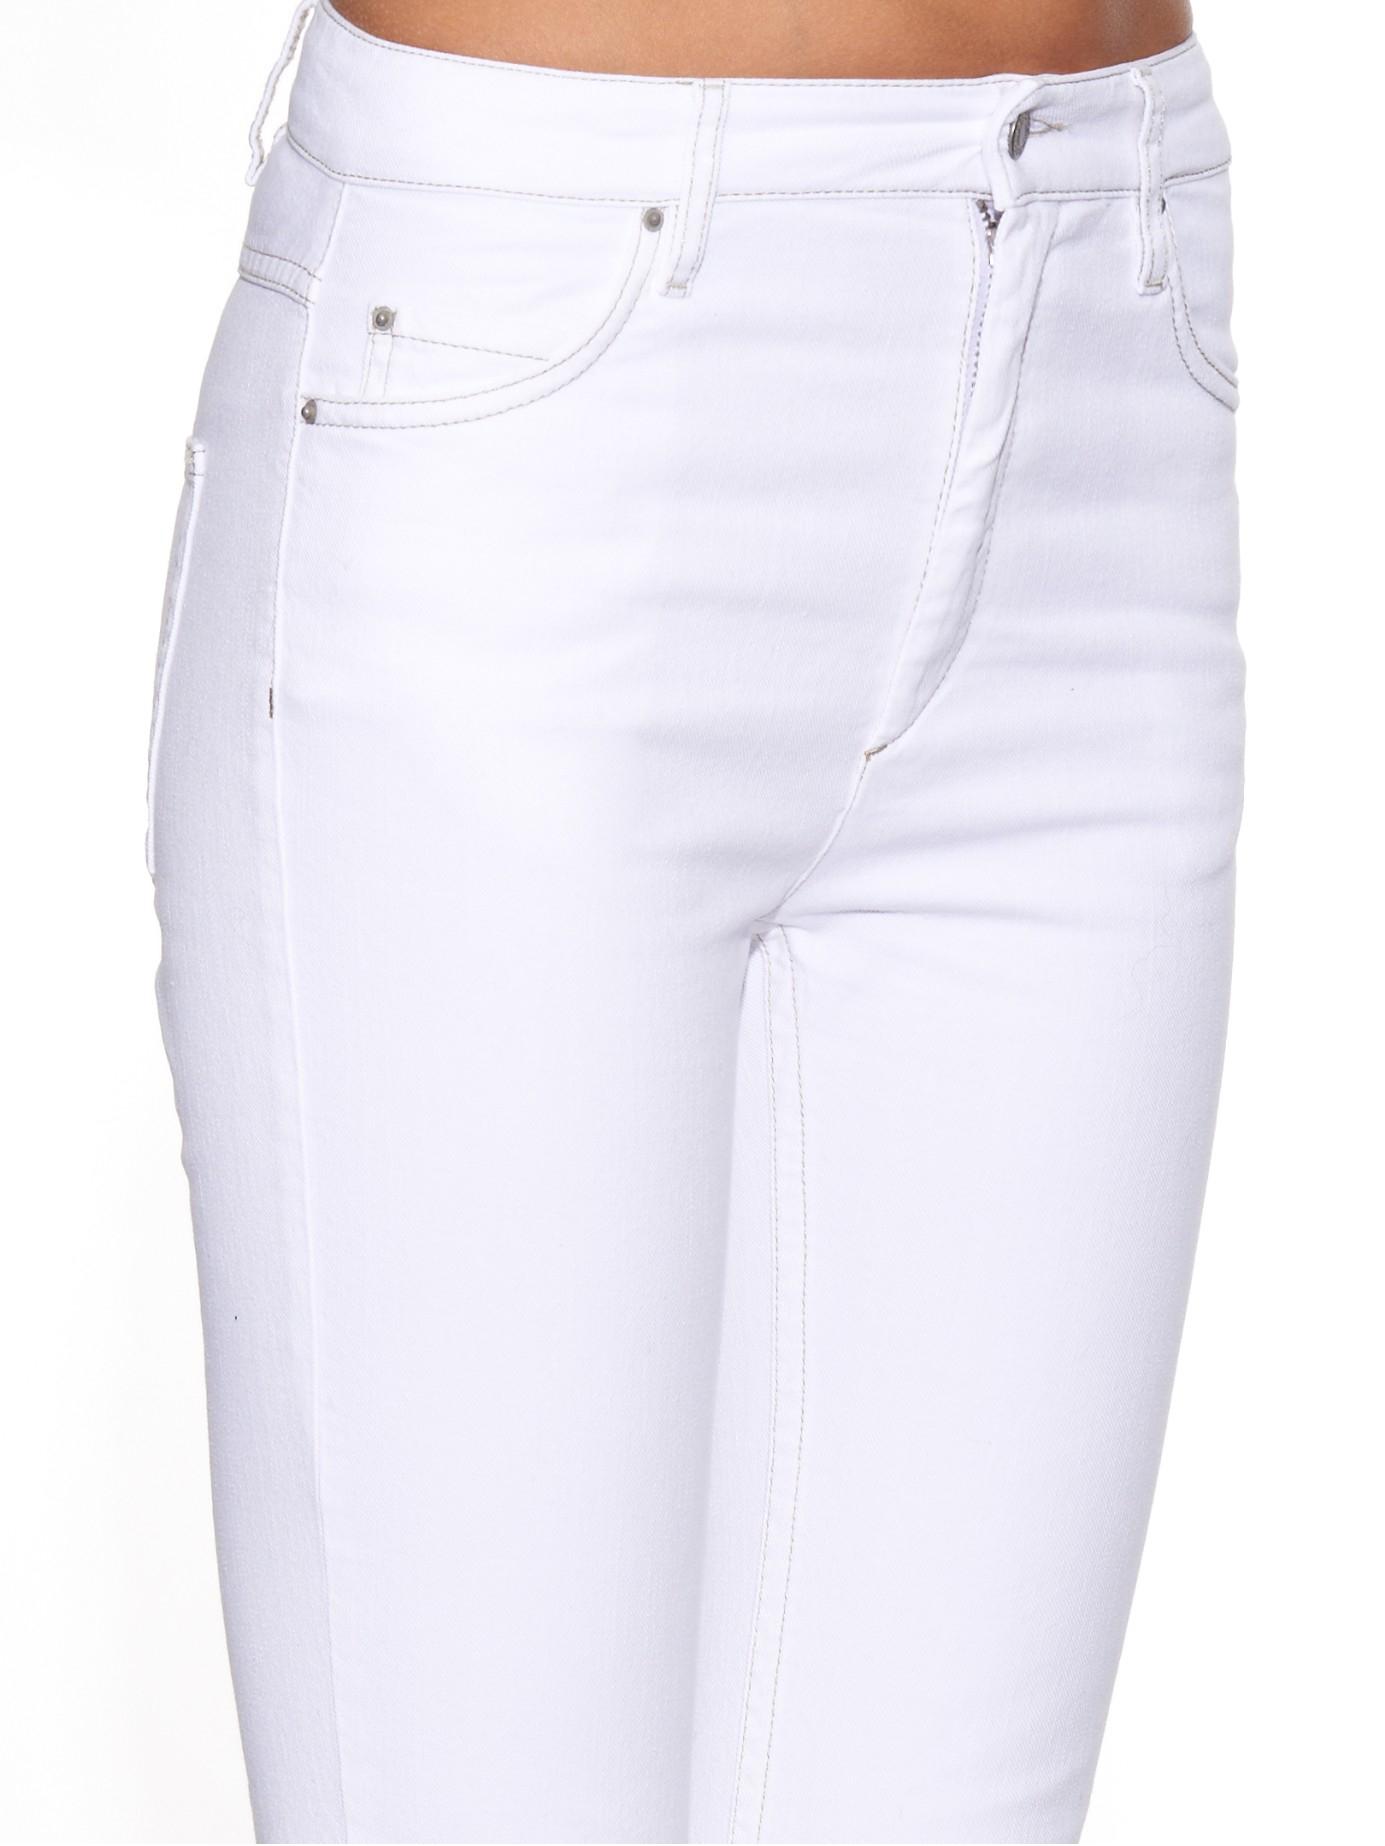 Étoile isabel marant Detta High-rise Skinny Jeans in White | Lyst